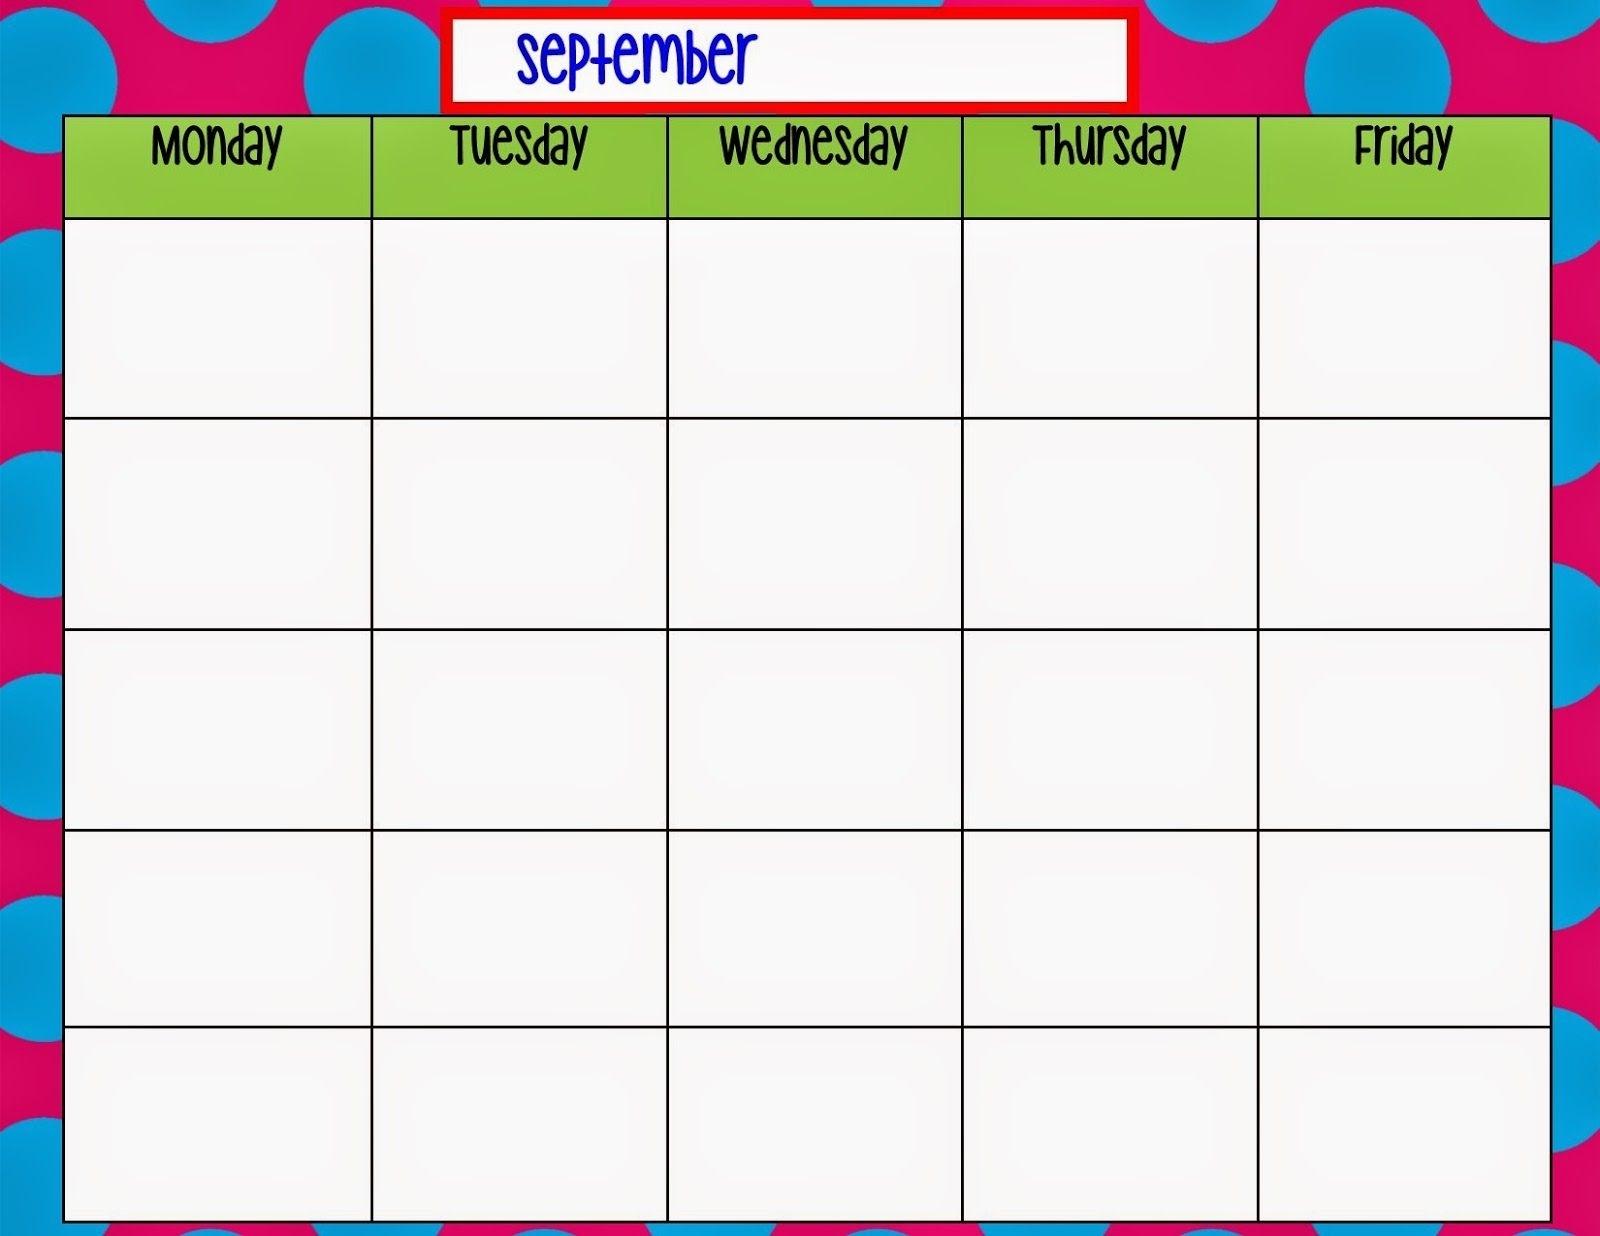 Monday Through Friday Calendar Template | Preschool | Printable pertaining to Blank Calendar Template Monday Friday